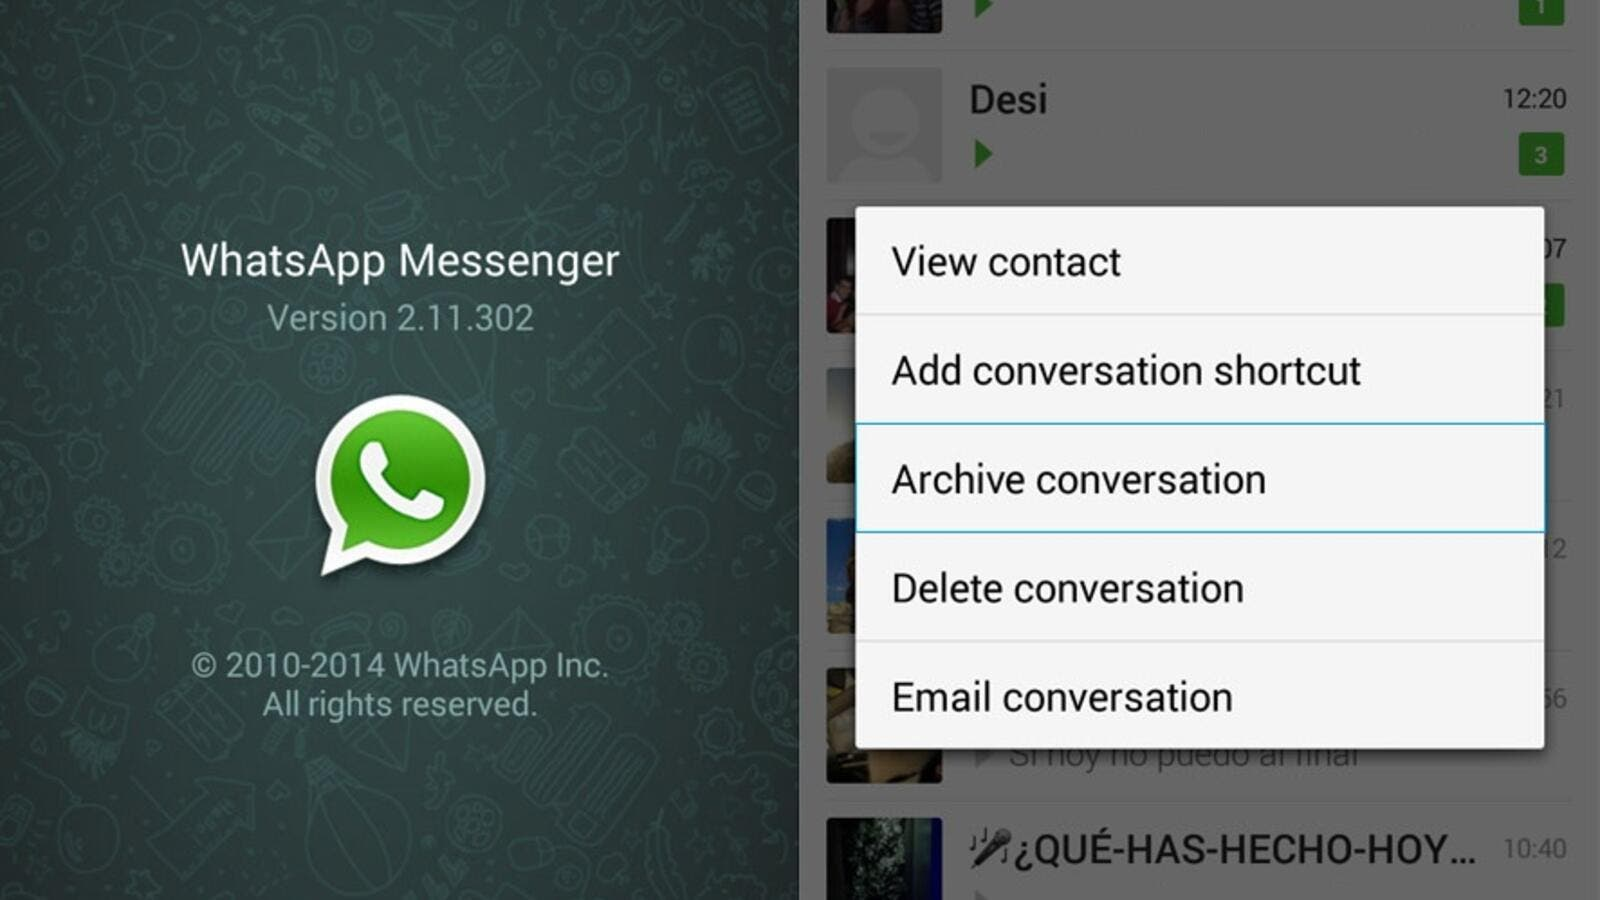 WhatsApp Video, Audio Calls Now Available in UAE | Al Bawaba